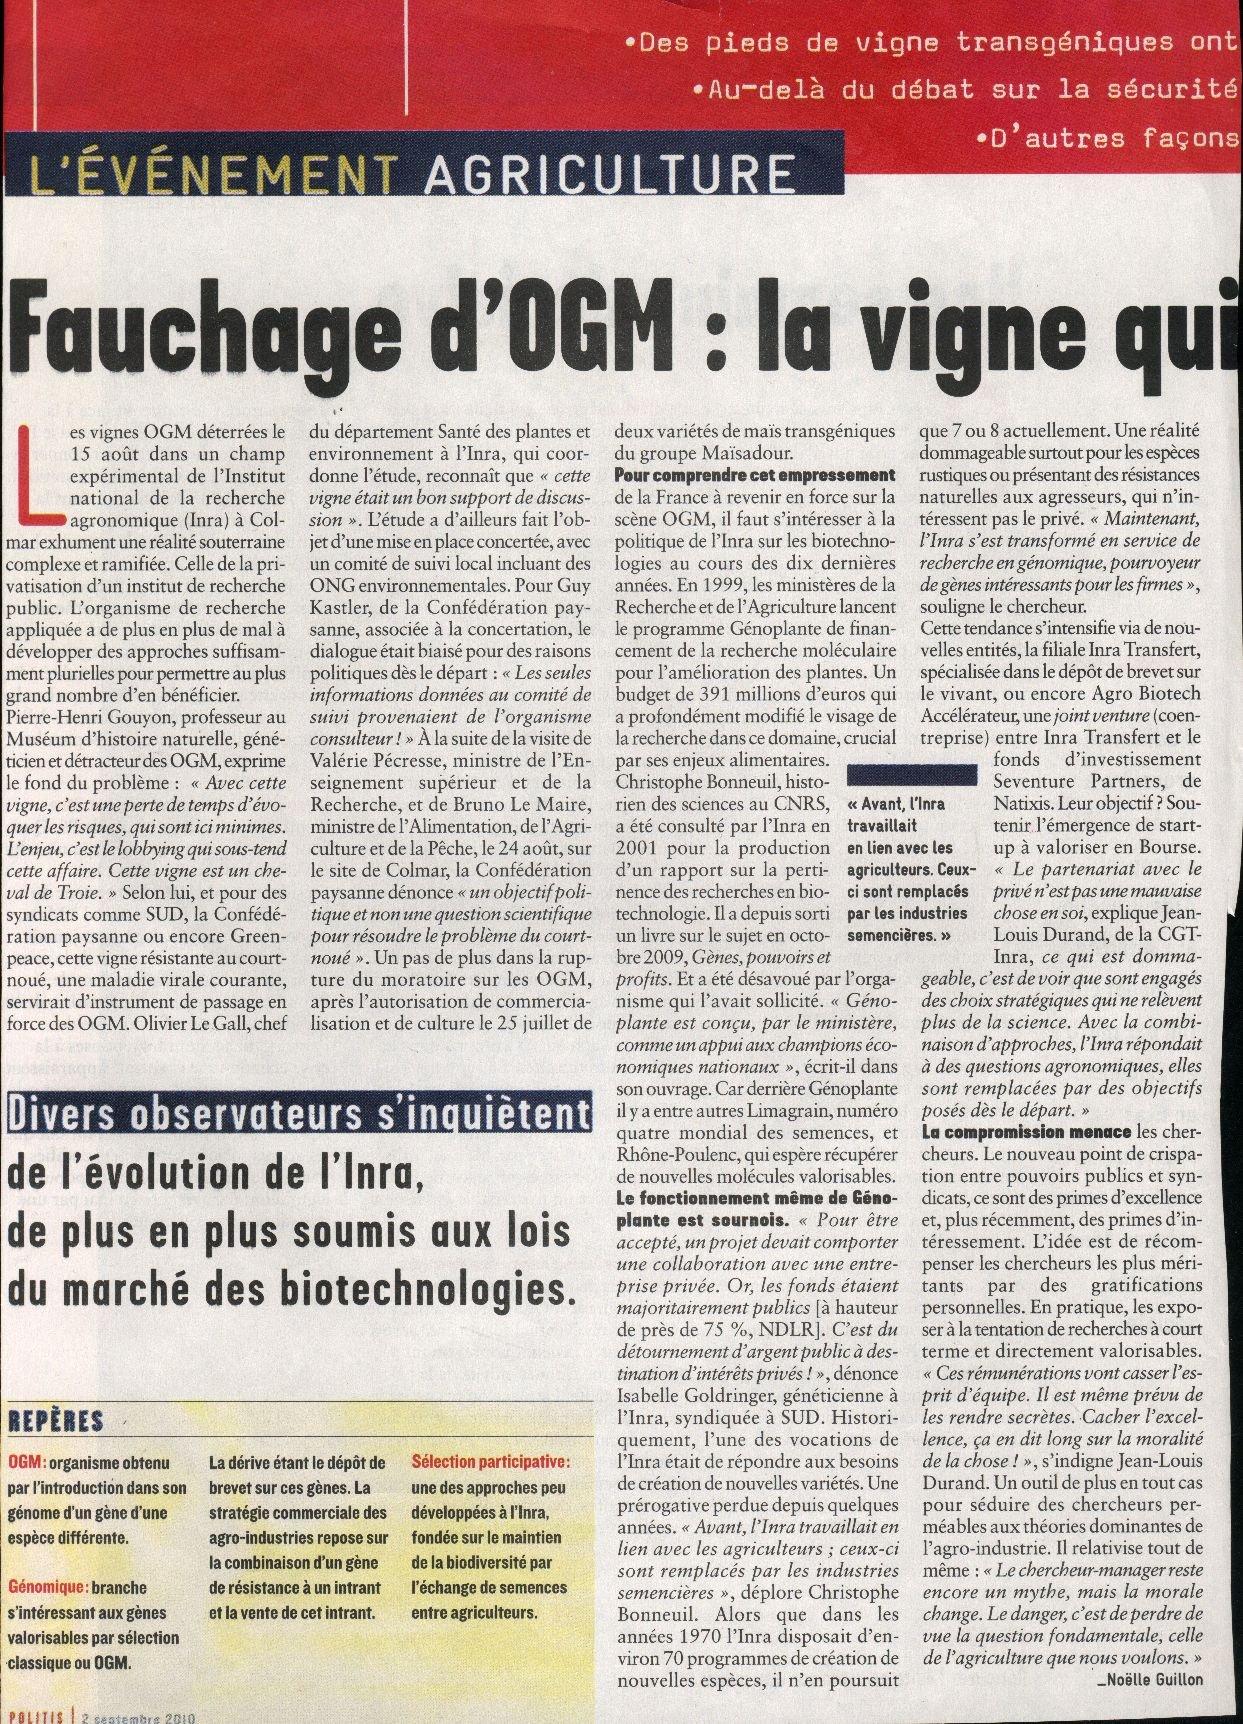 http://sd-1.archive-host.com/membres/up/83700288762628507/ogm_colmar/fauchage_0001.jpg